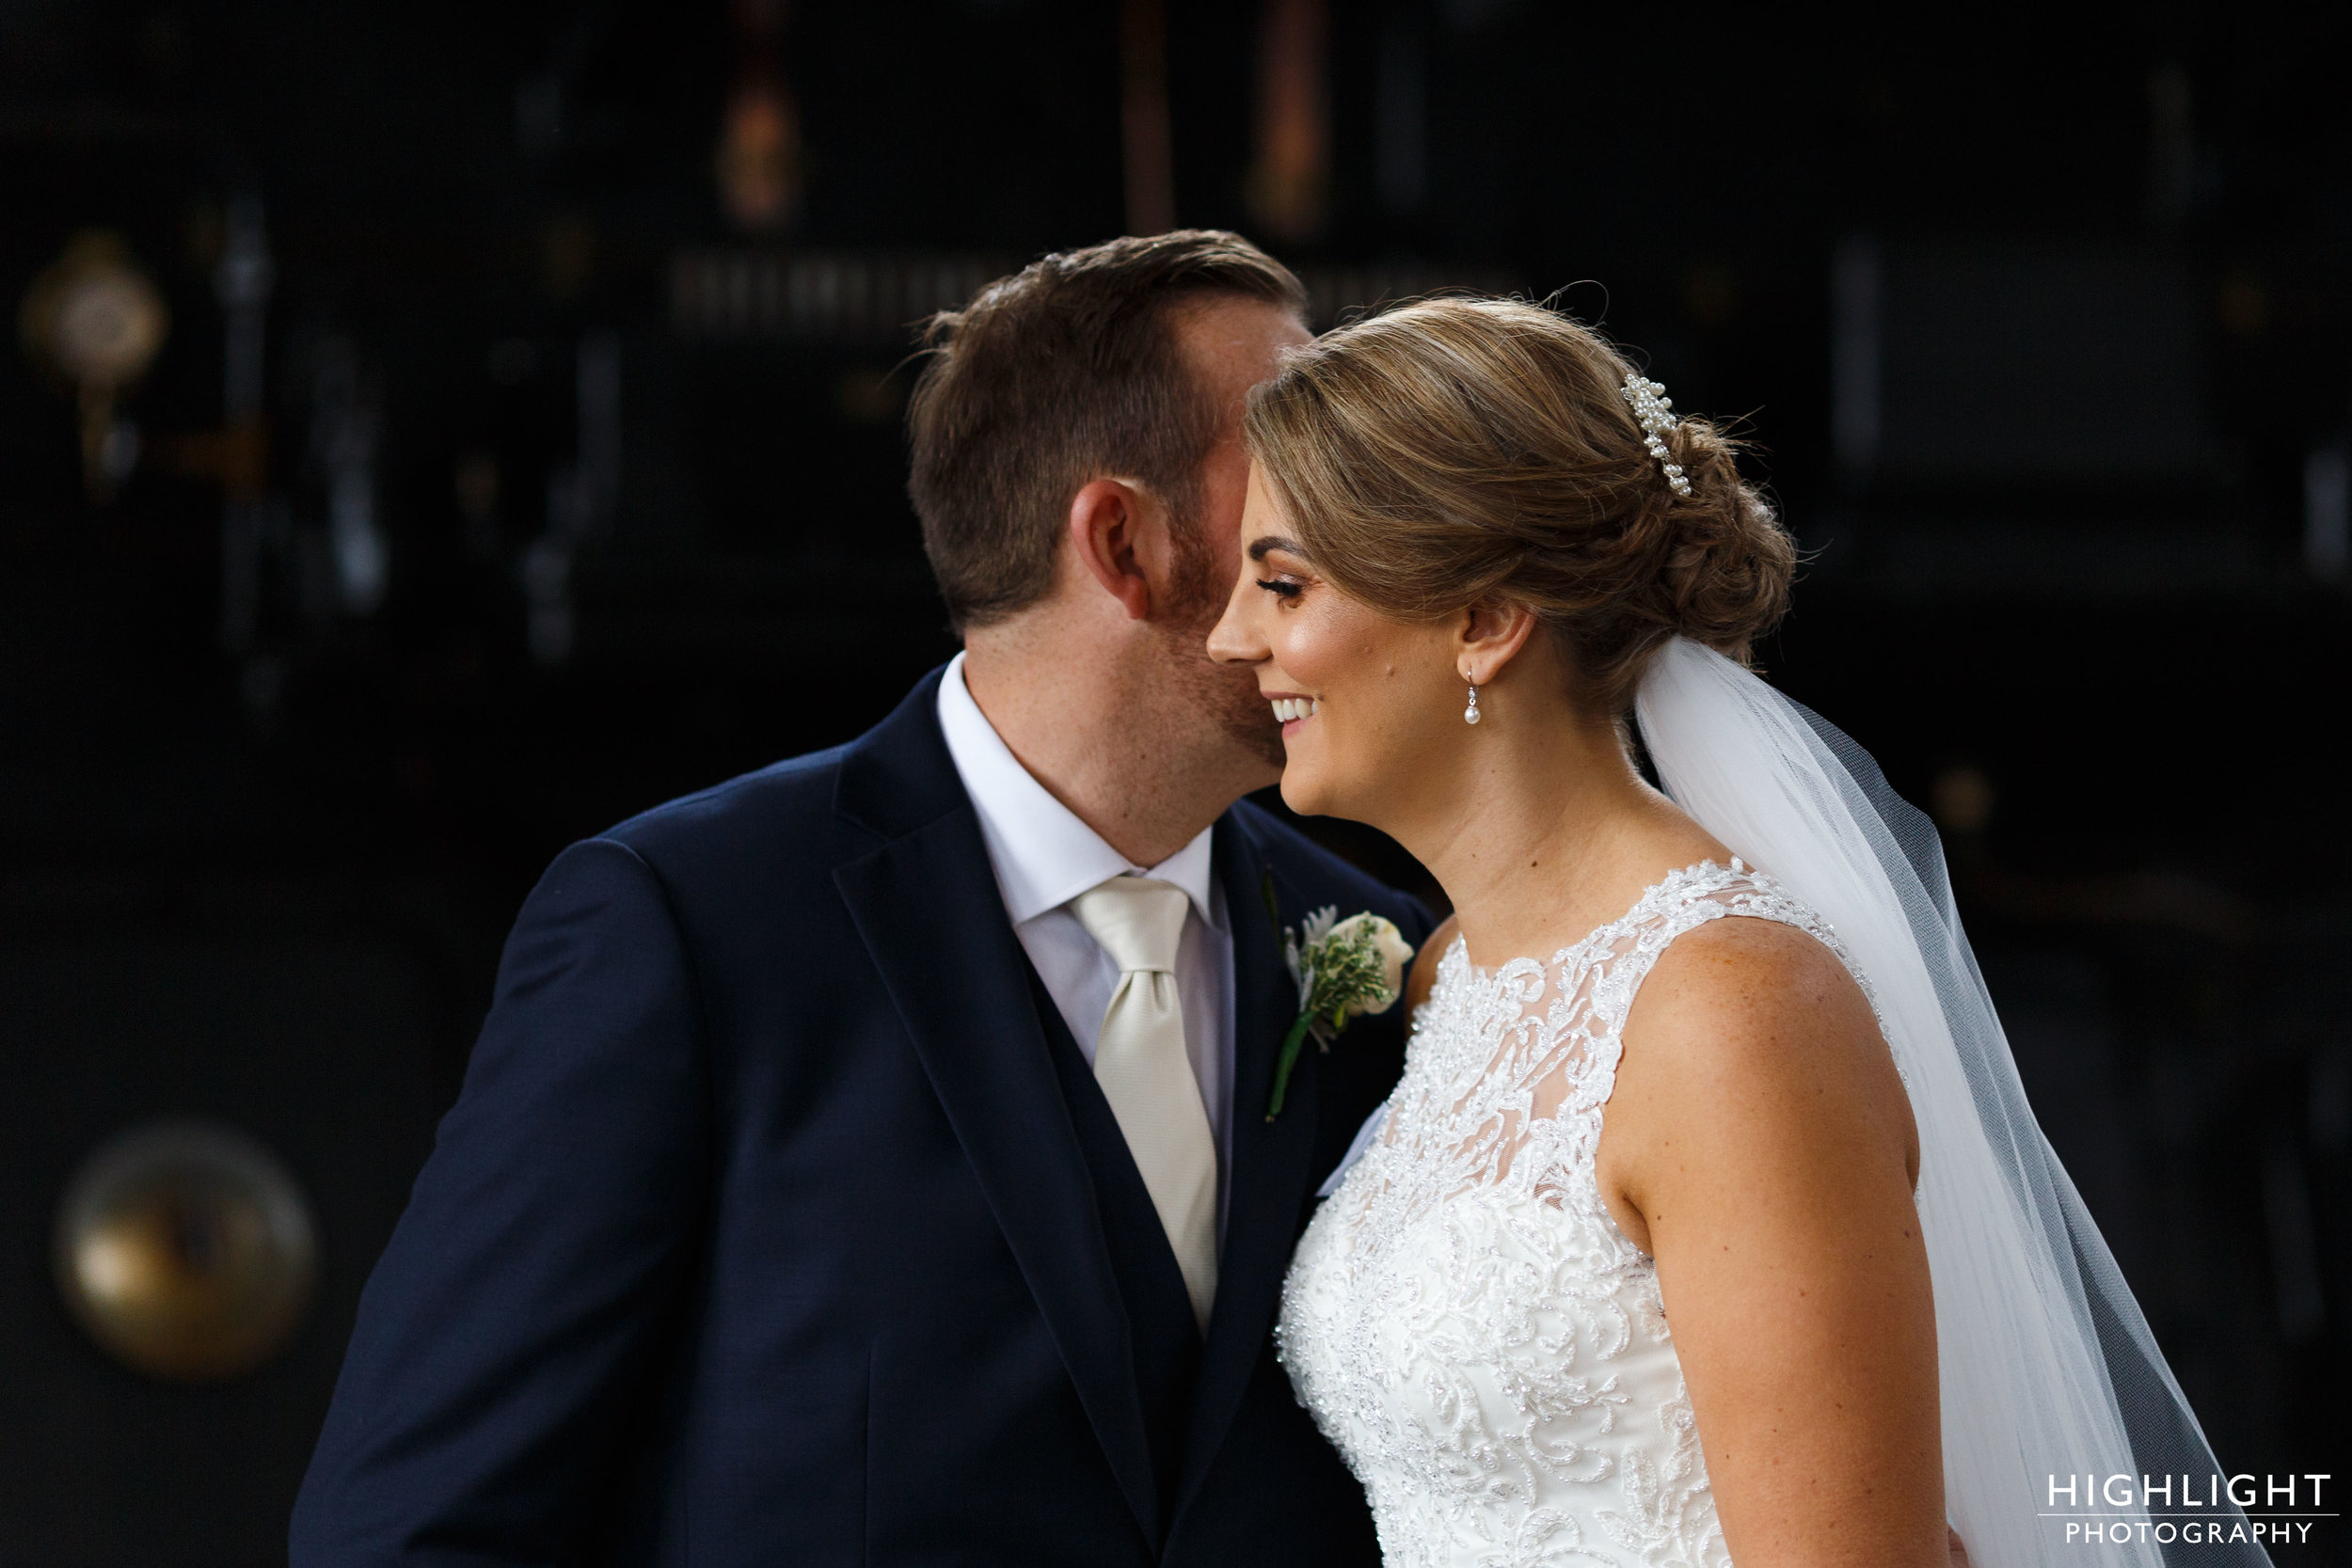 highlight-wedding-photography-palmerston-north-new-zealand-orlando-country-club-wedding-68.jpg